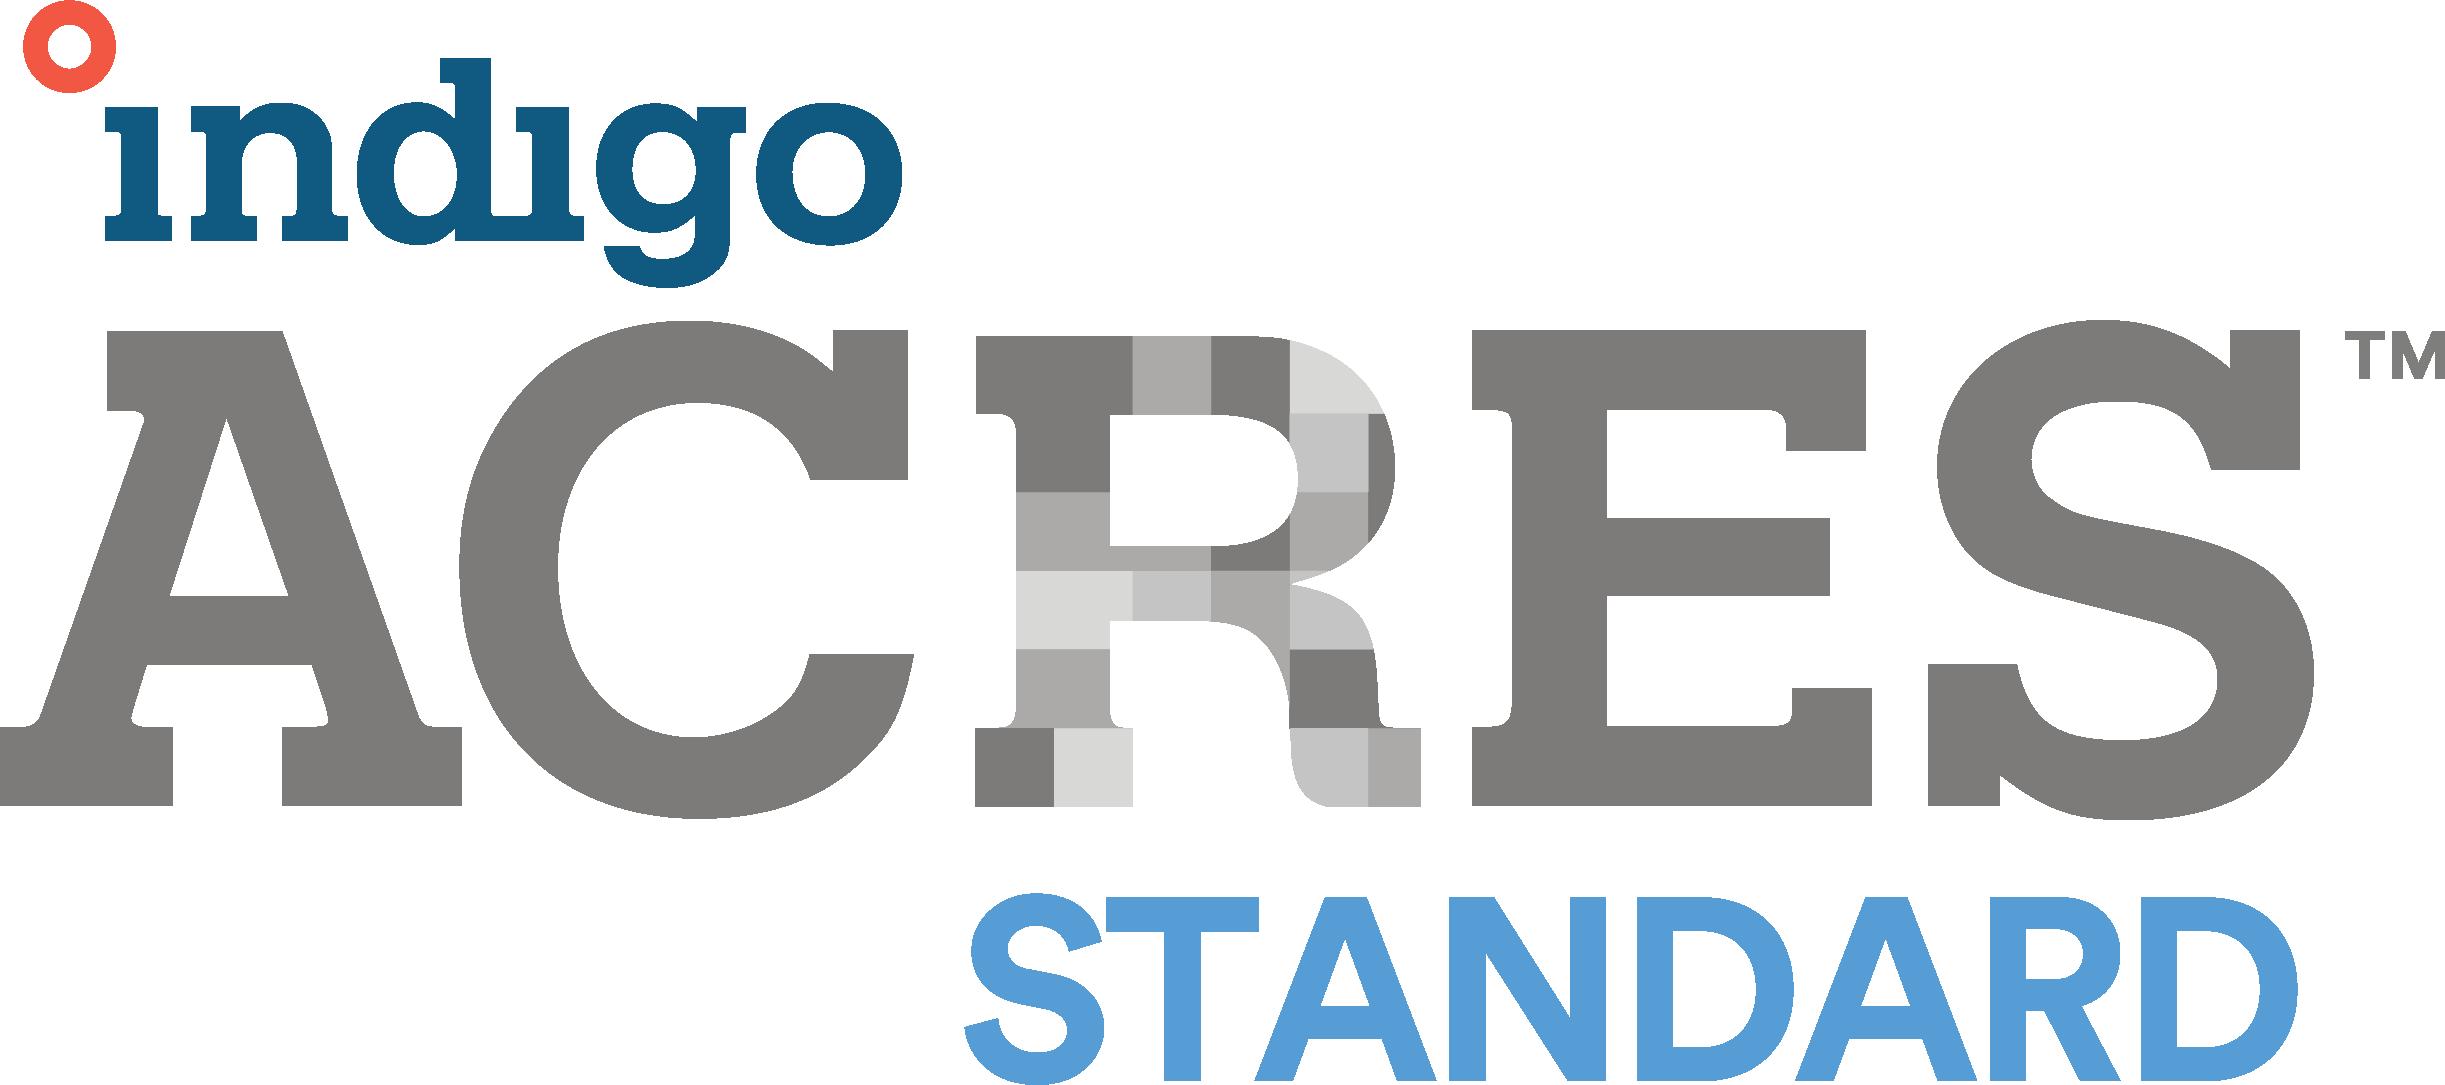 Indigo_Acres_Standard